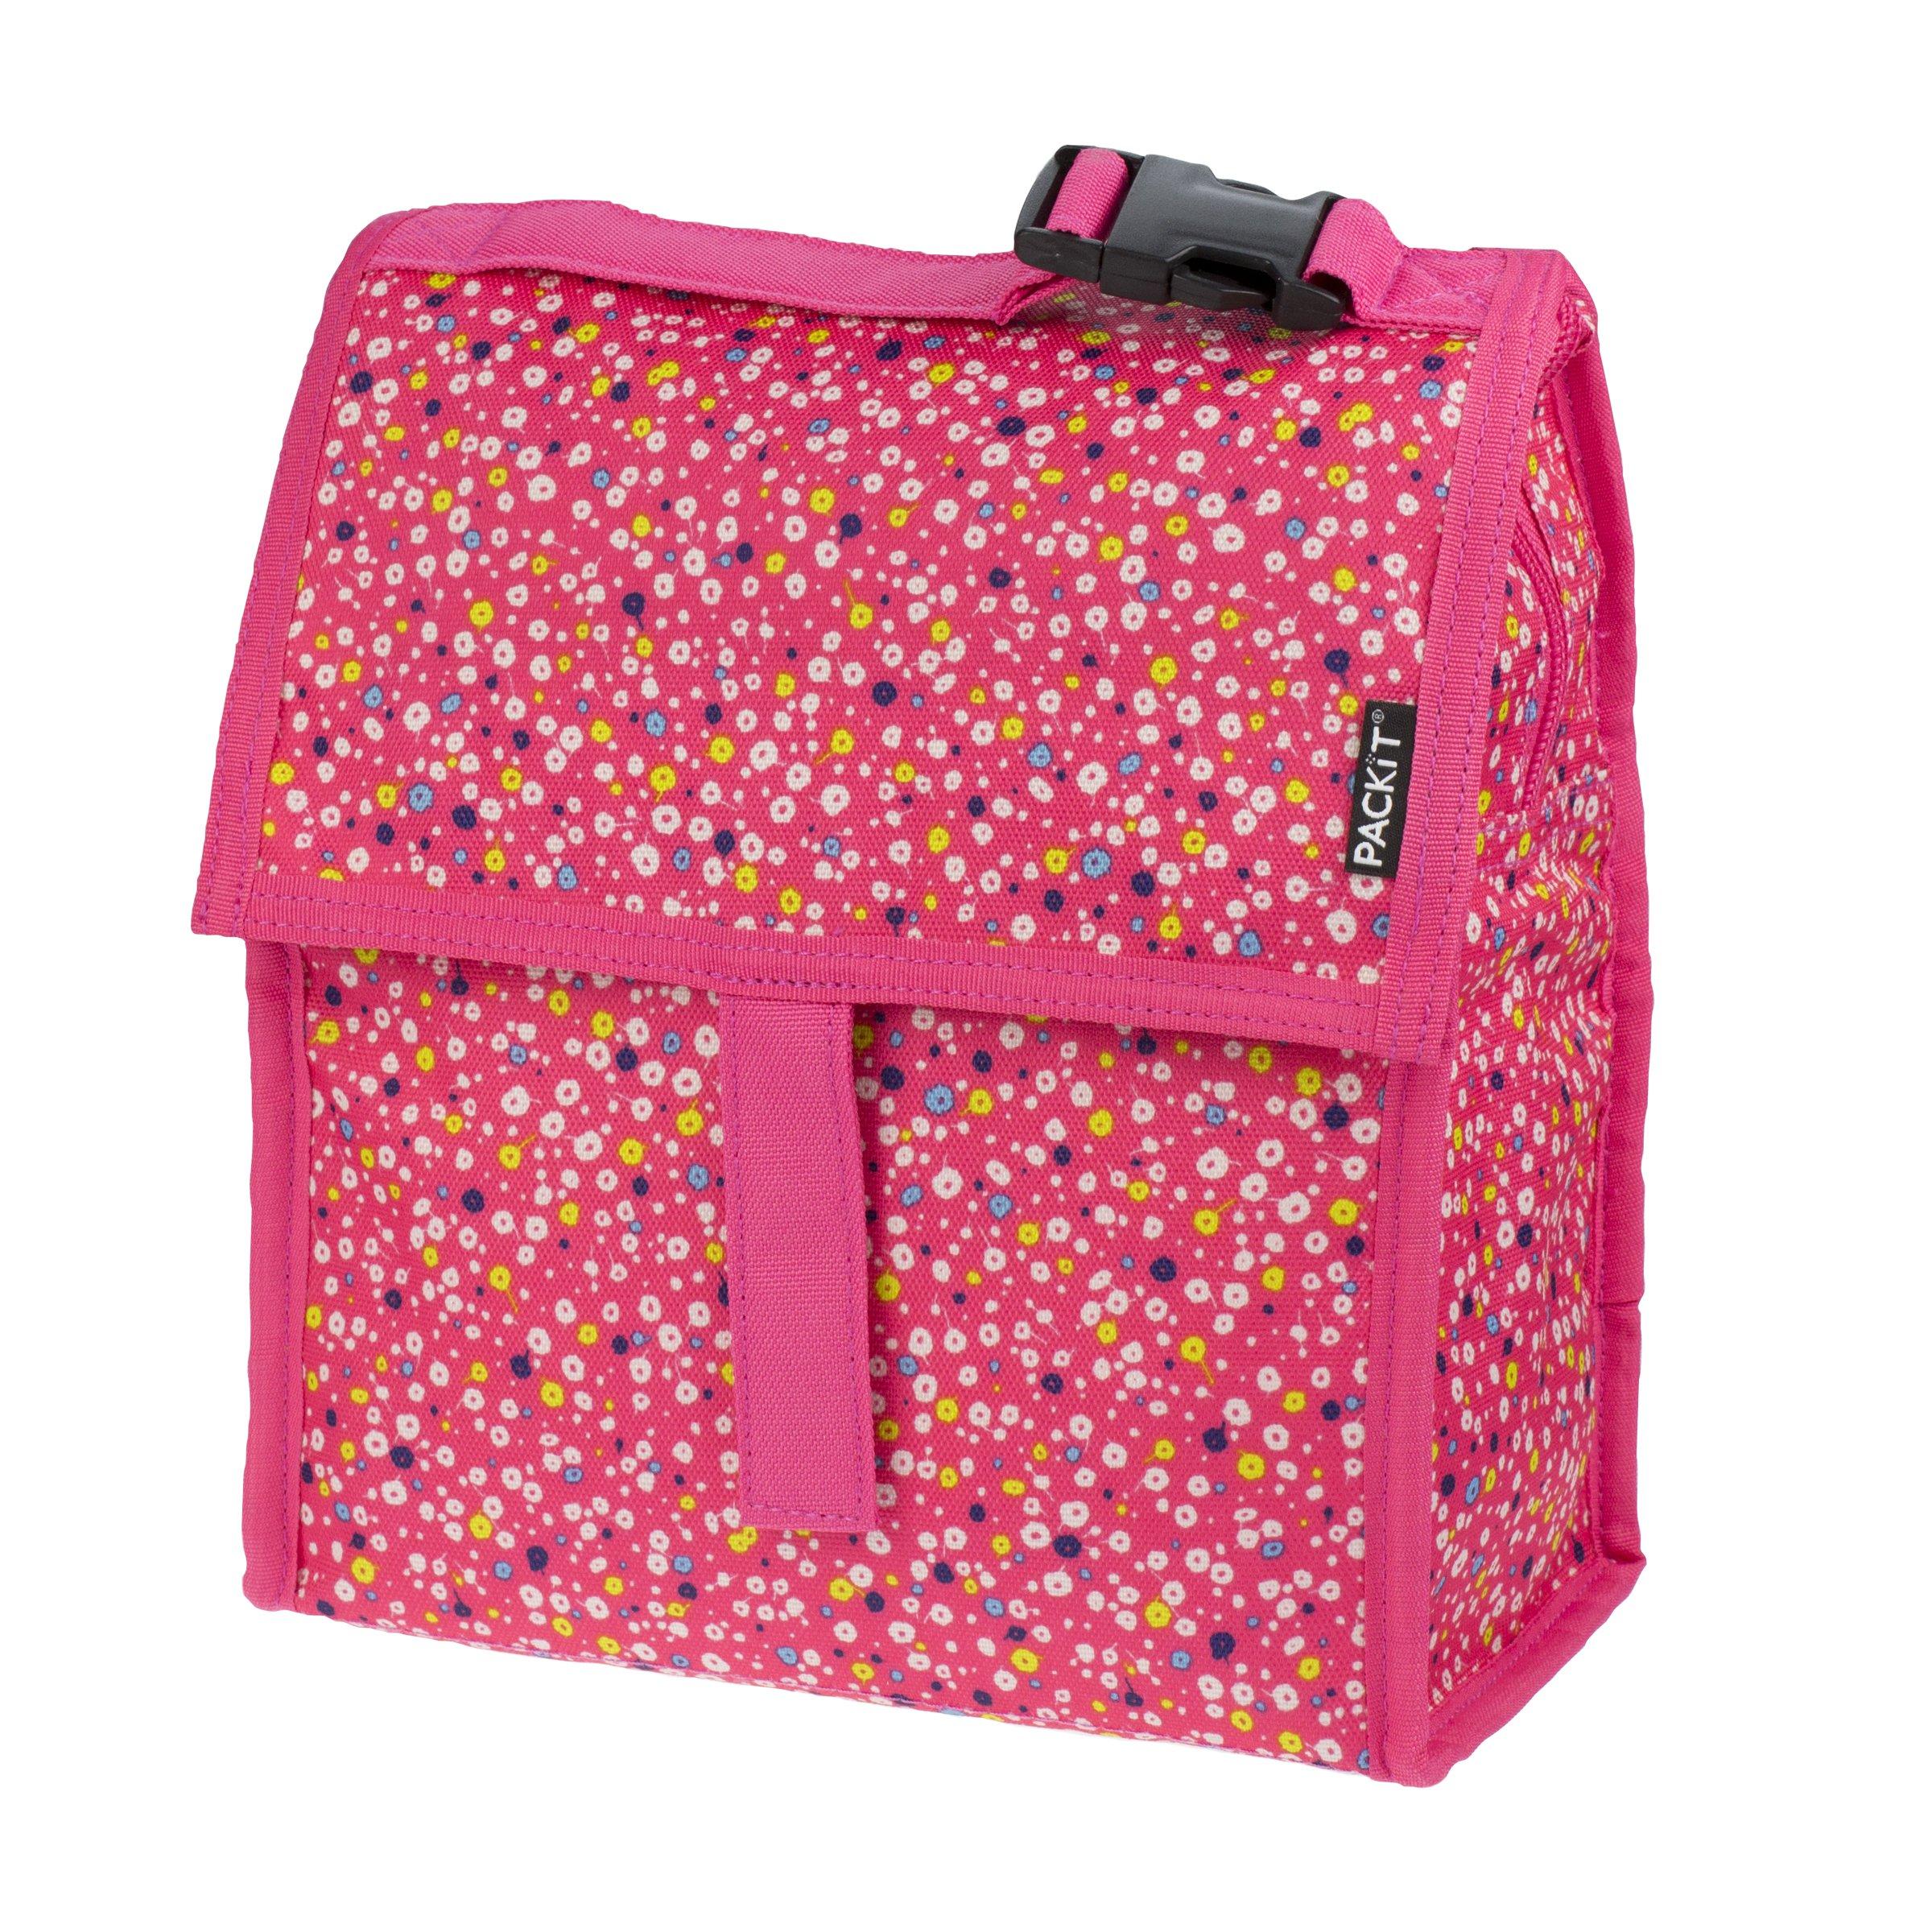 PackIt Bolsa para Almuerzo congelable, Poppies: Amazon.es: Hogar